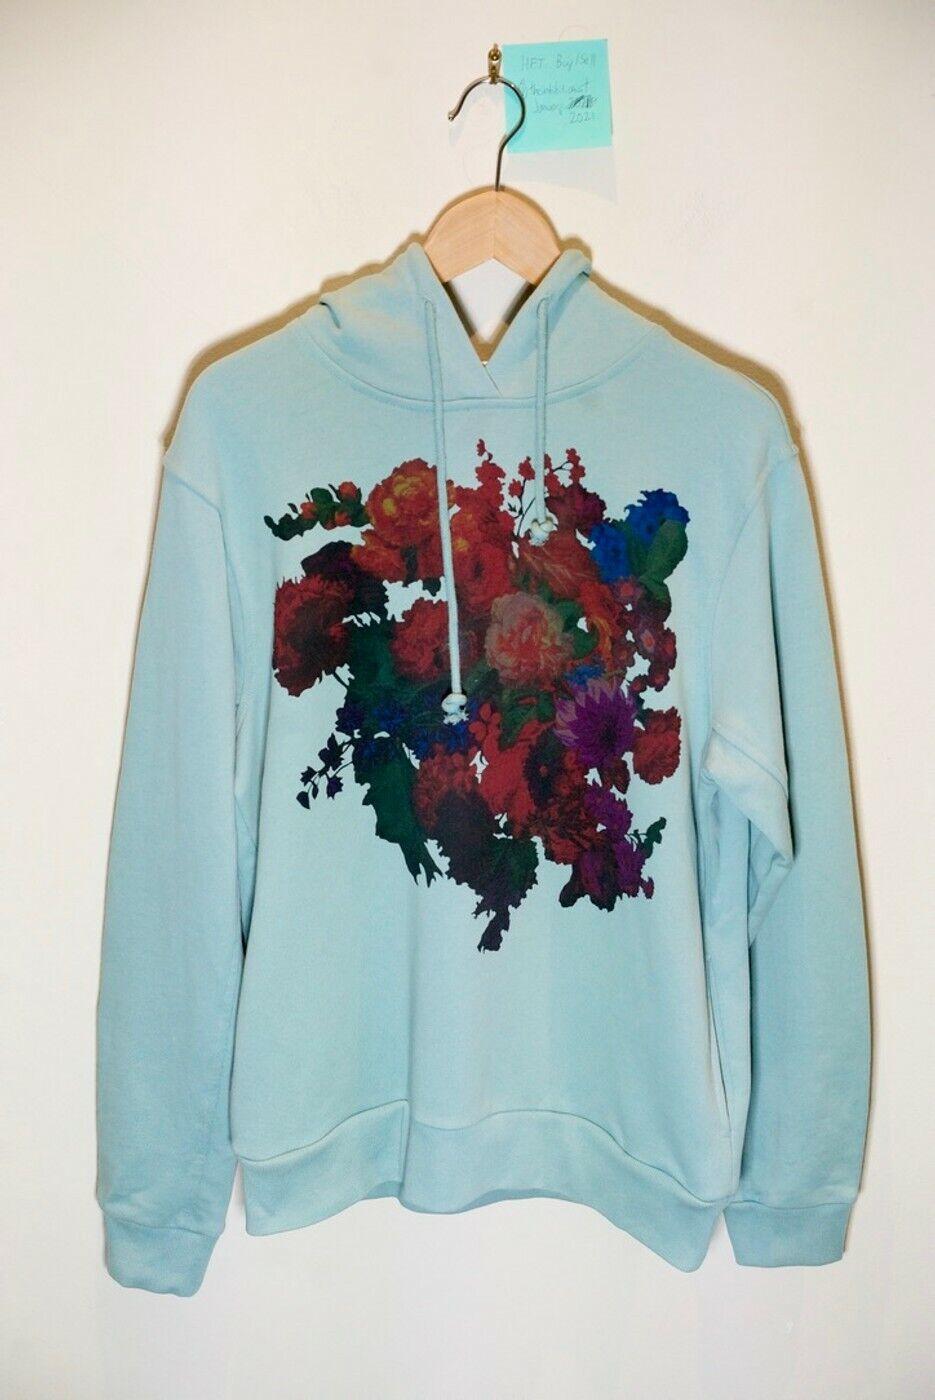 Dries Van Noten SS20 Floral Graphic Hoodie